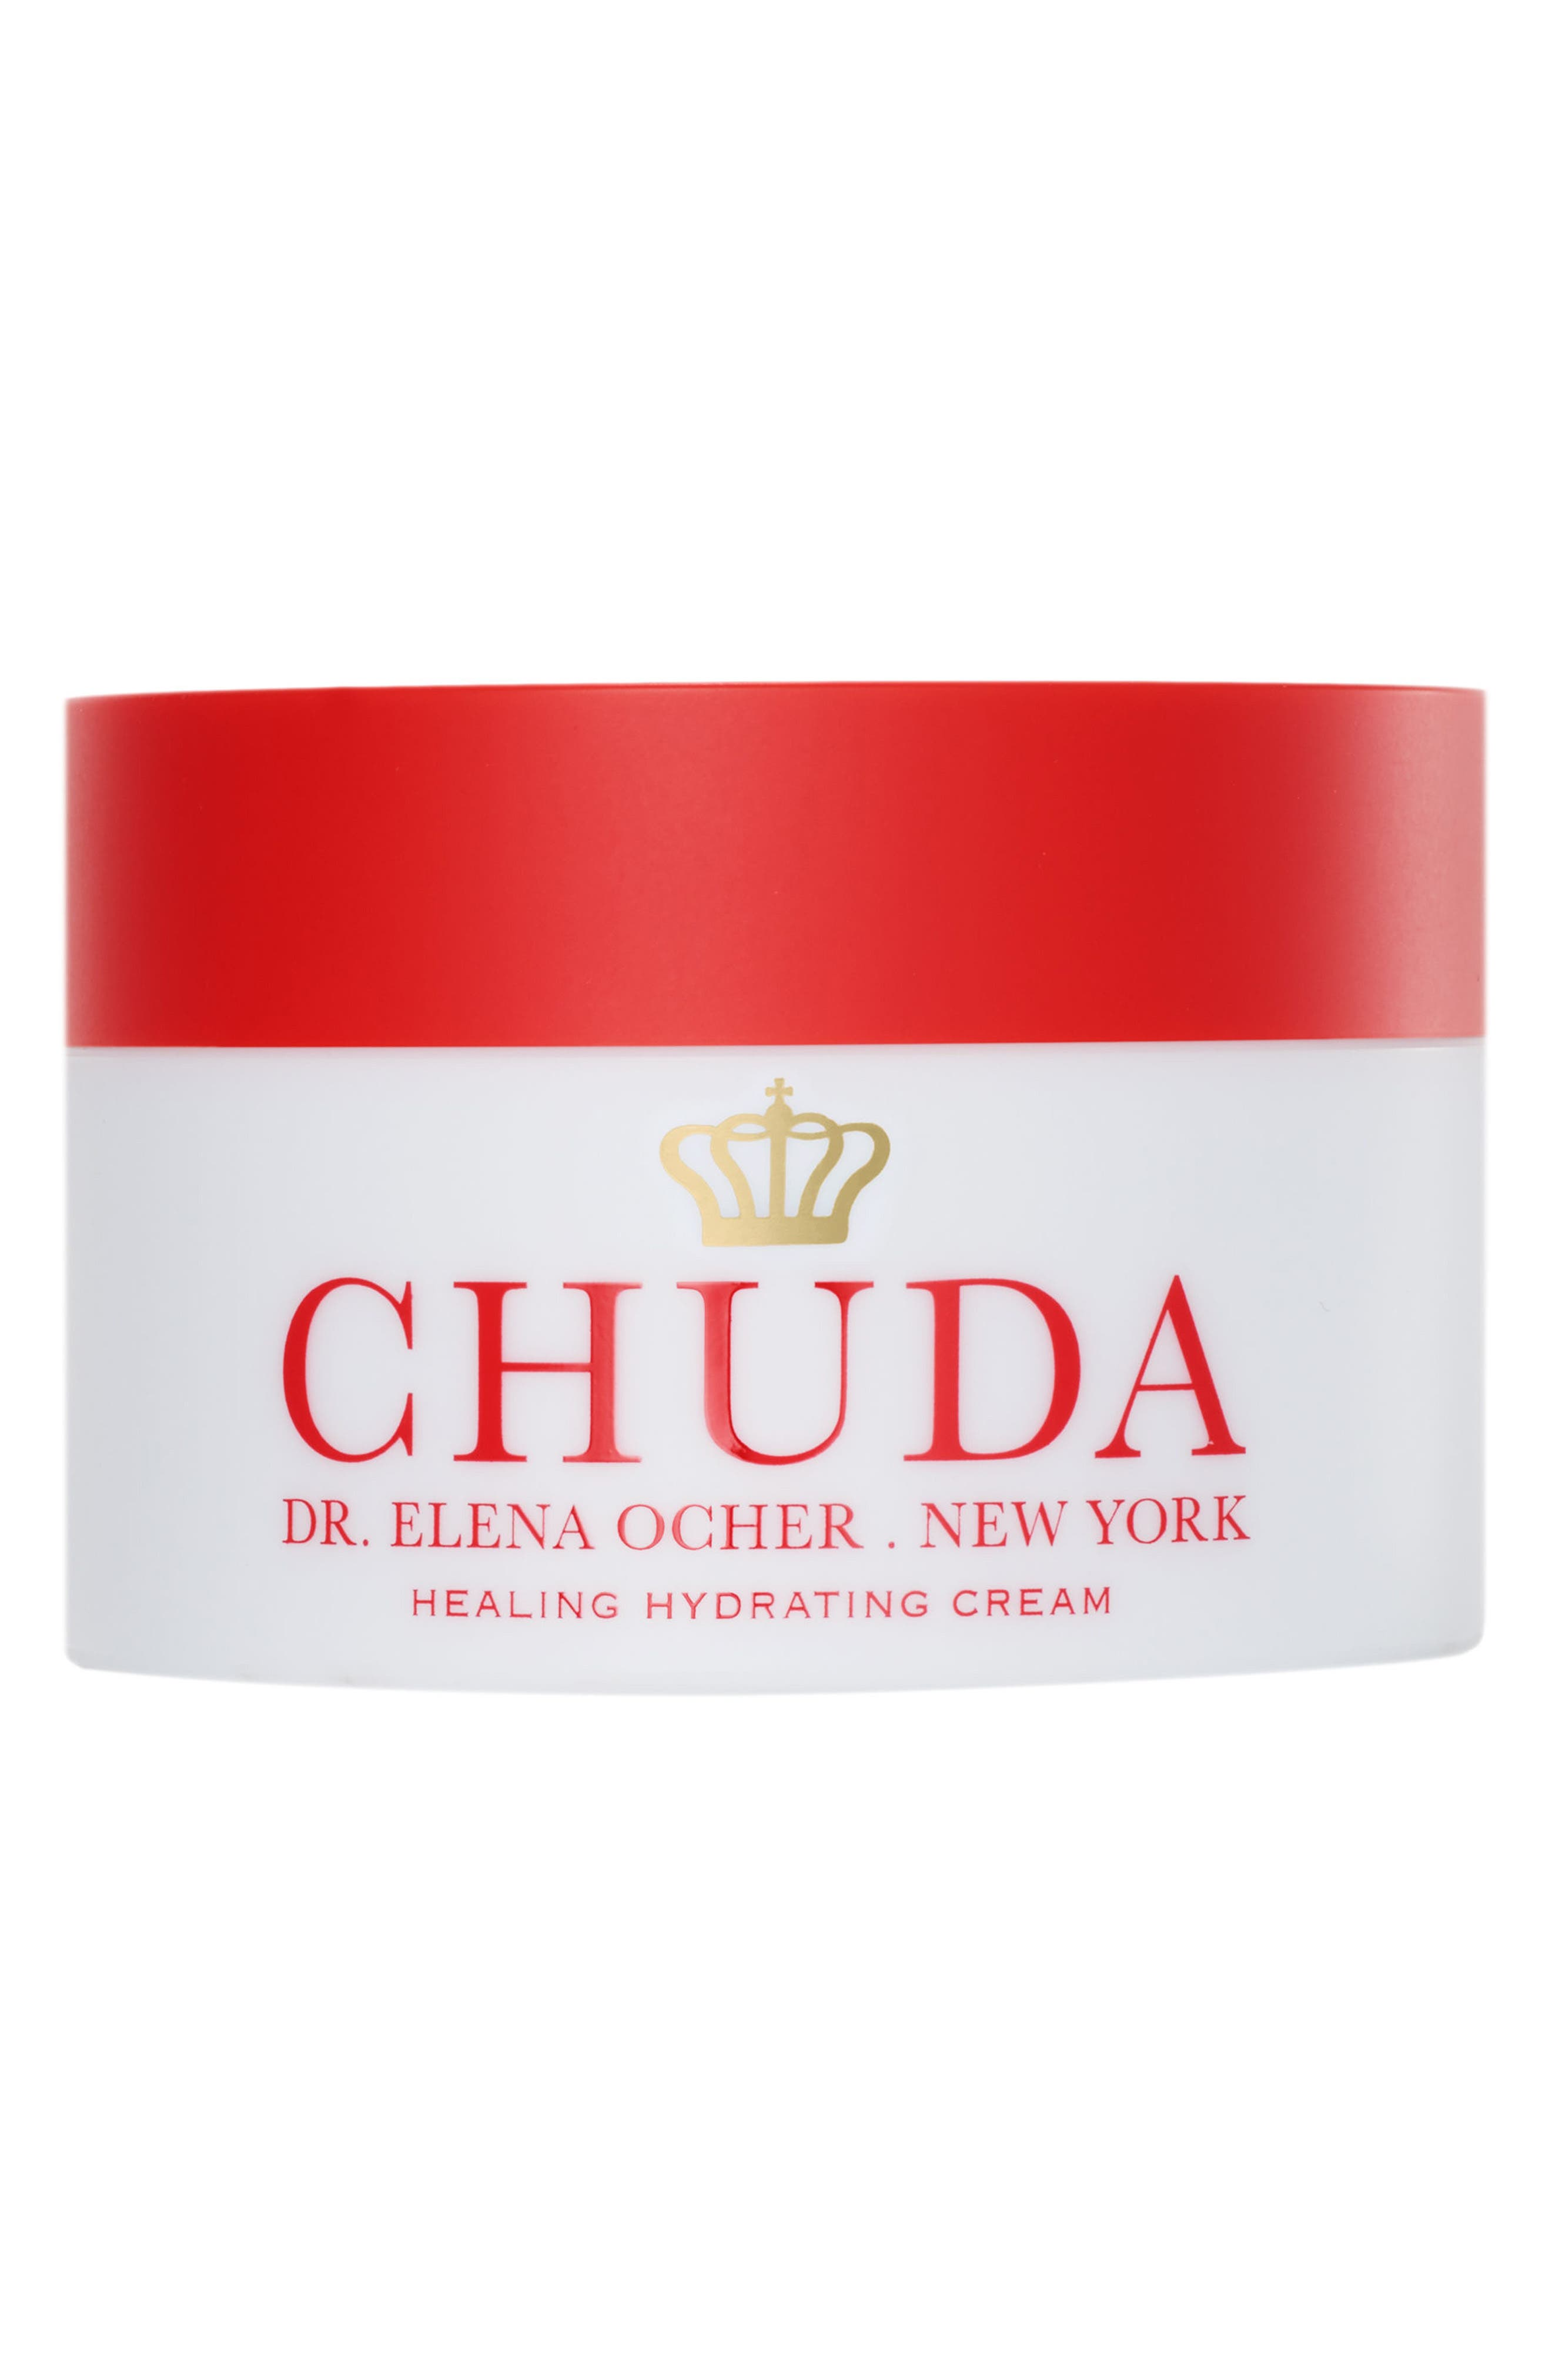 Alternate Image 1 Selected - Chuda Healing Hydrating Cream